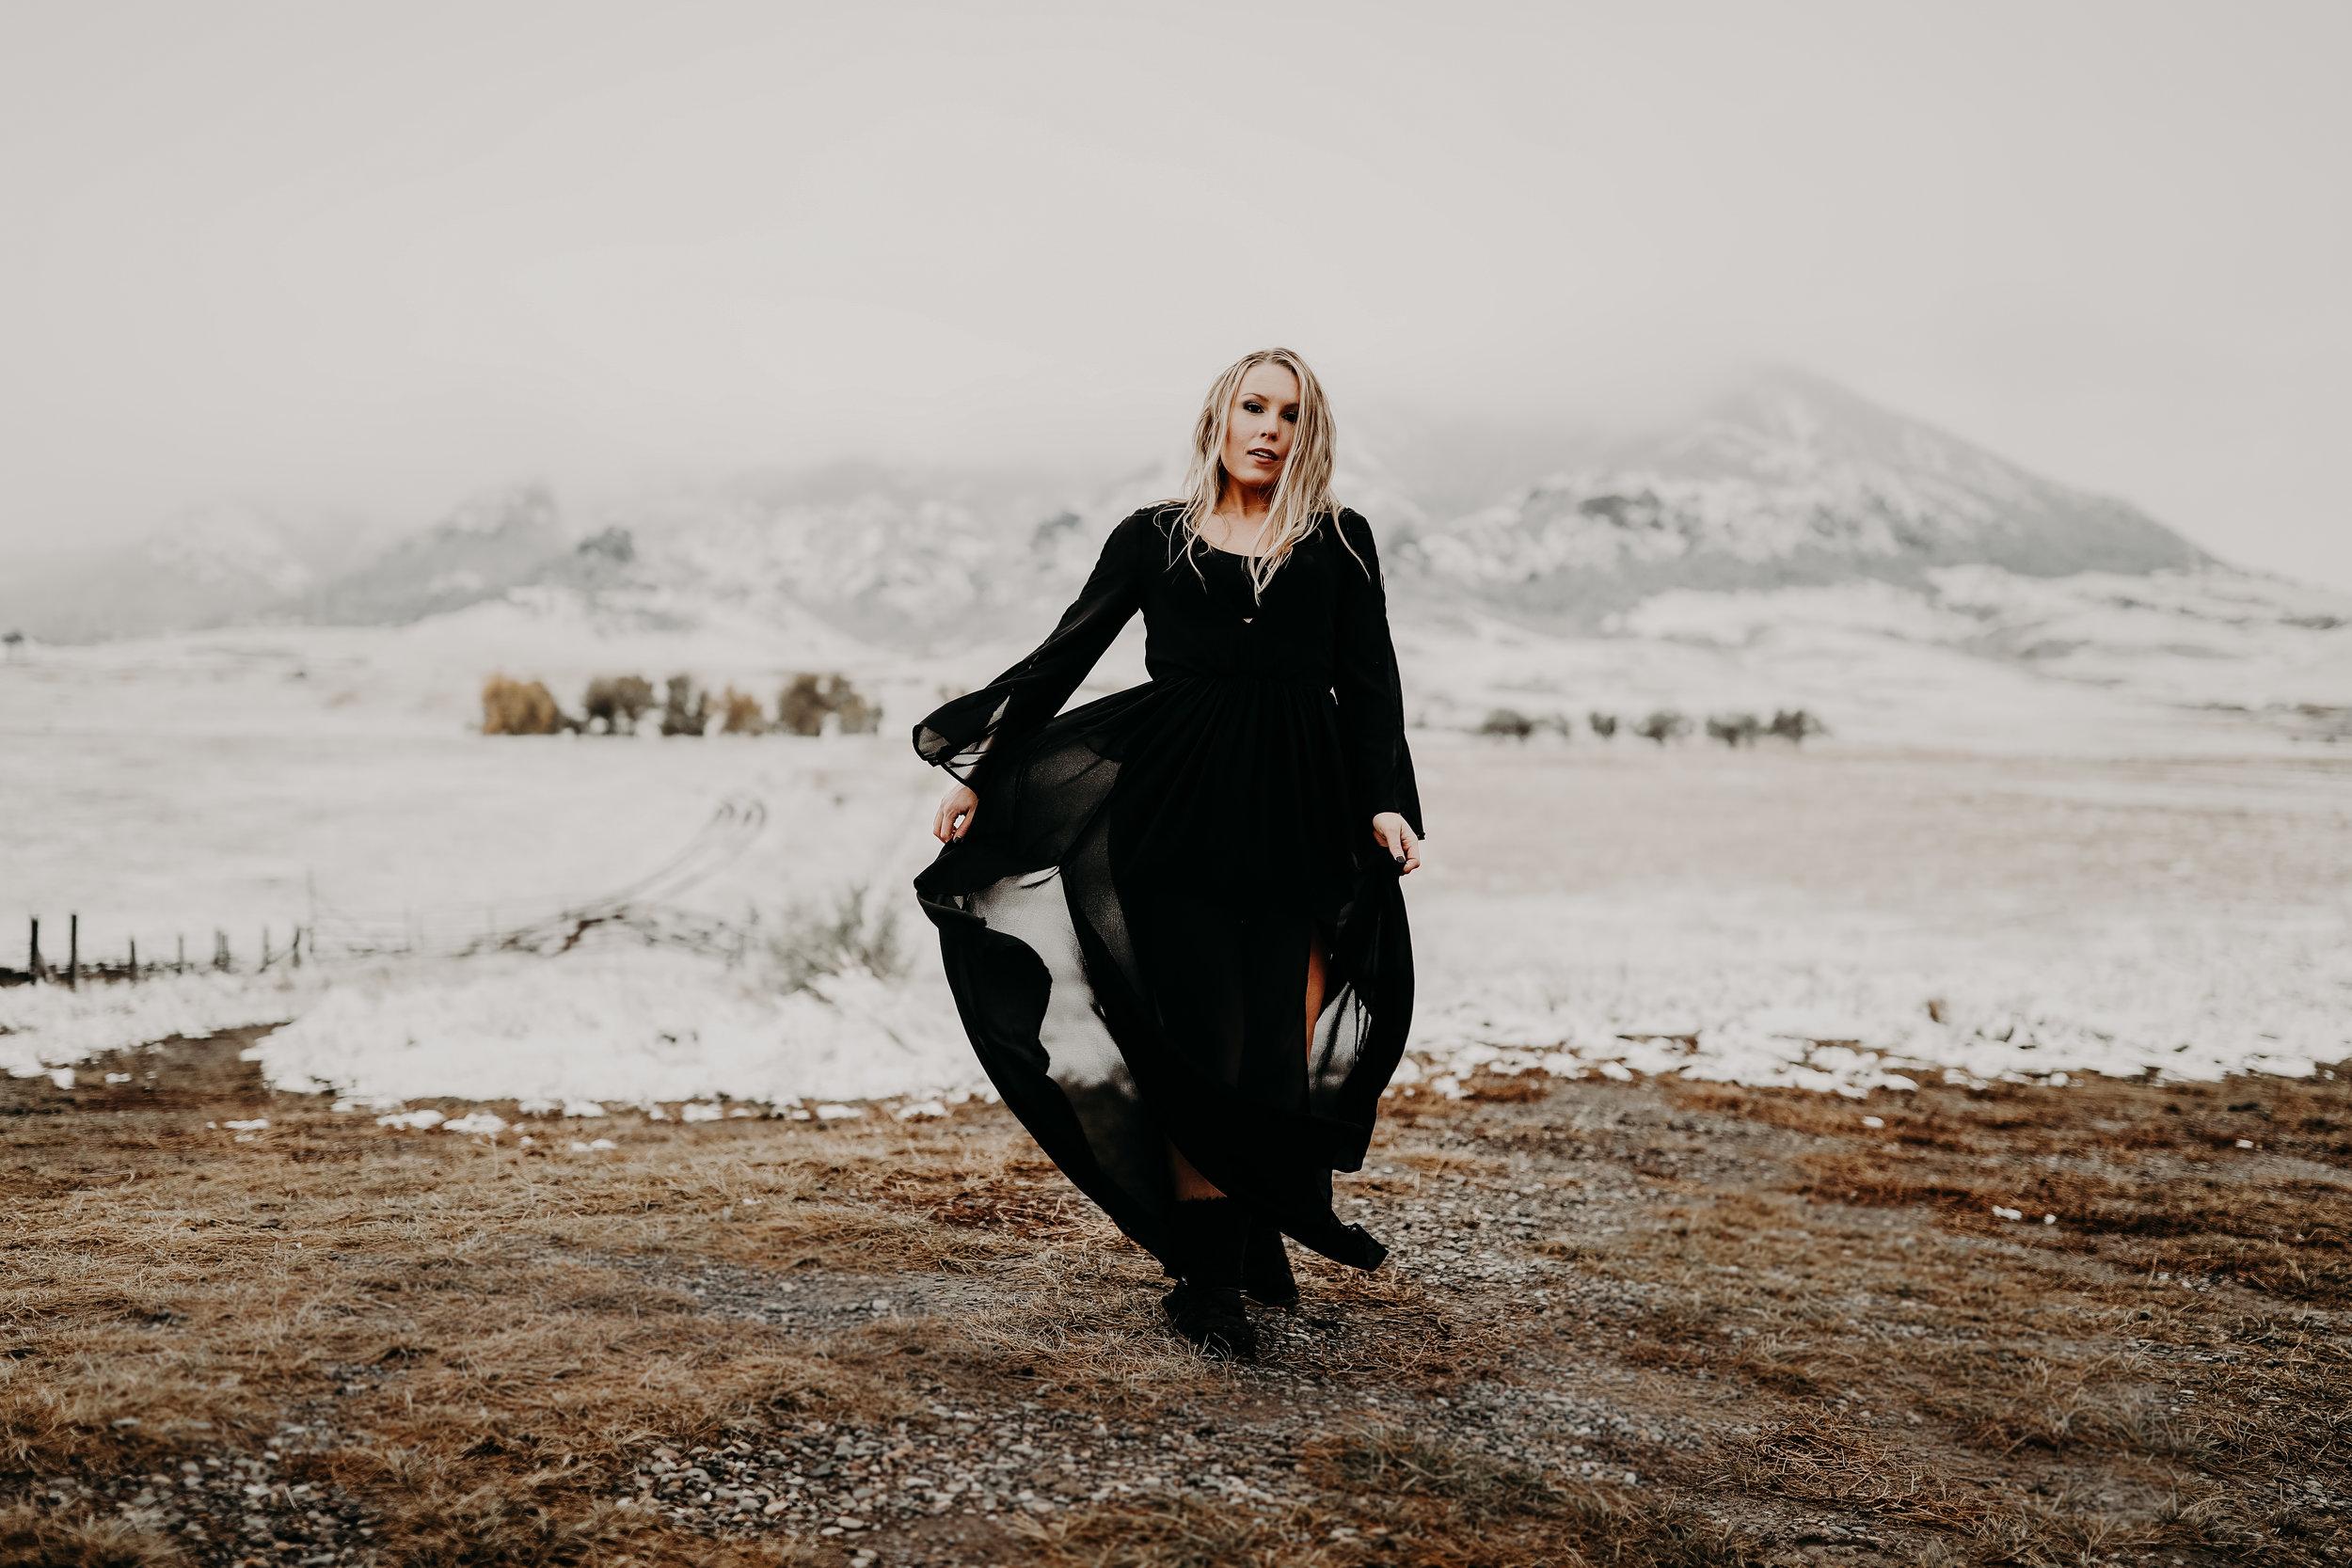 Veronica - Cascade, MT